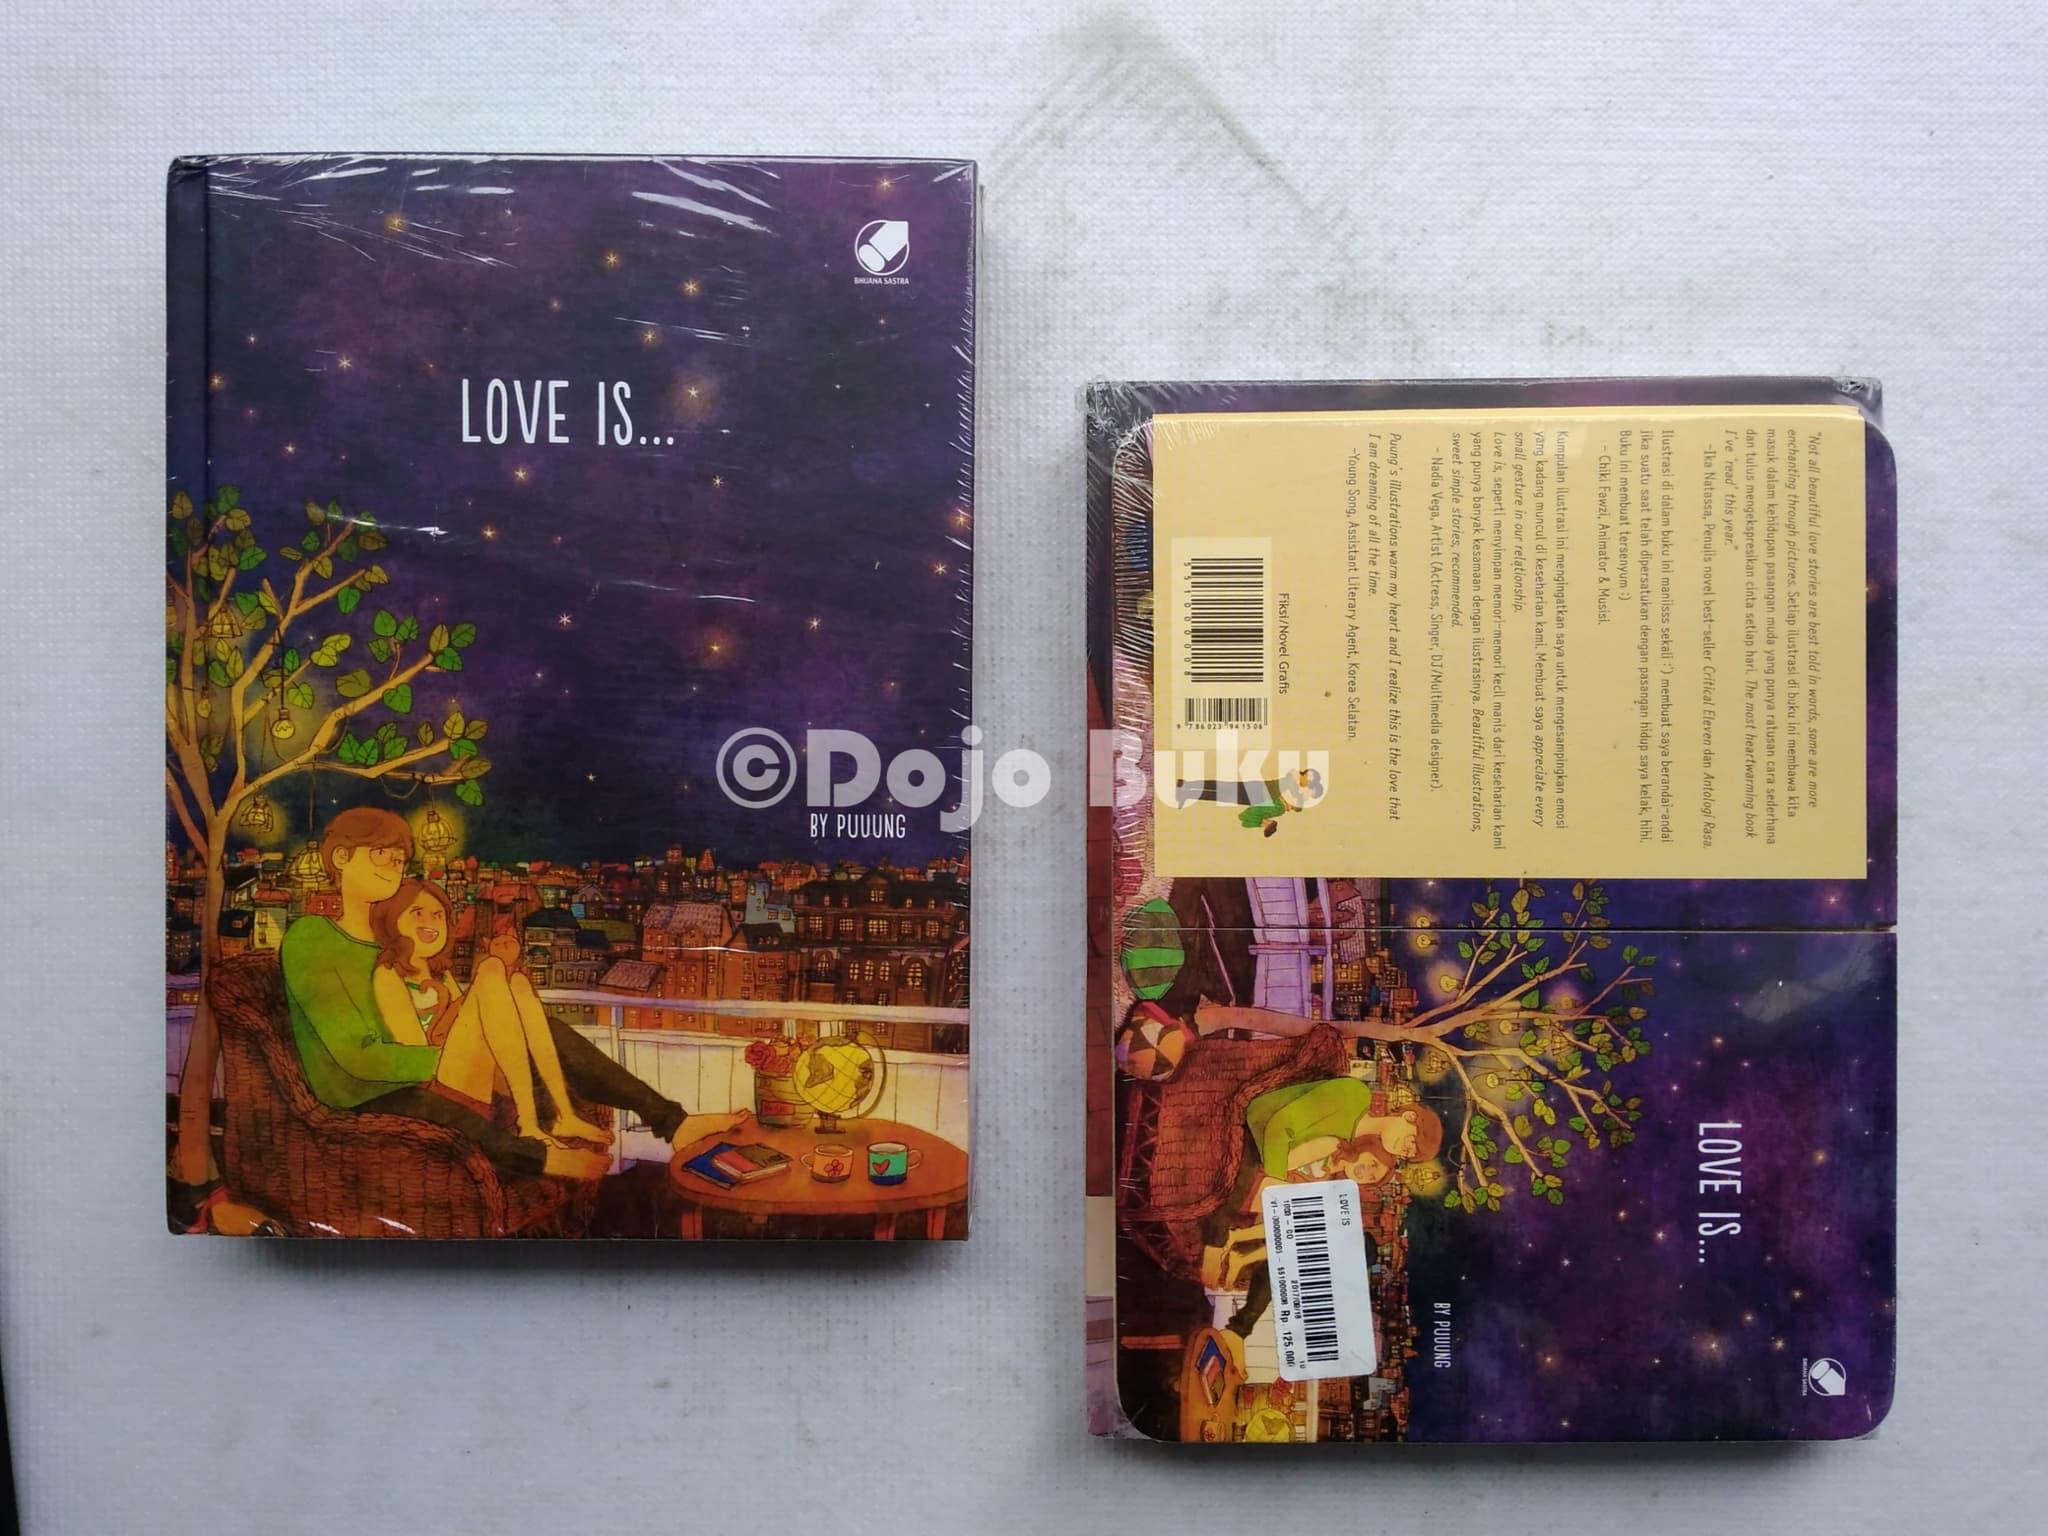 jual love is oleh puuung dojo buku tokopedia